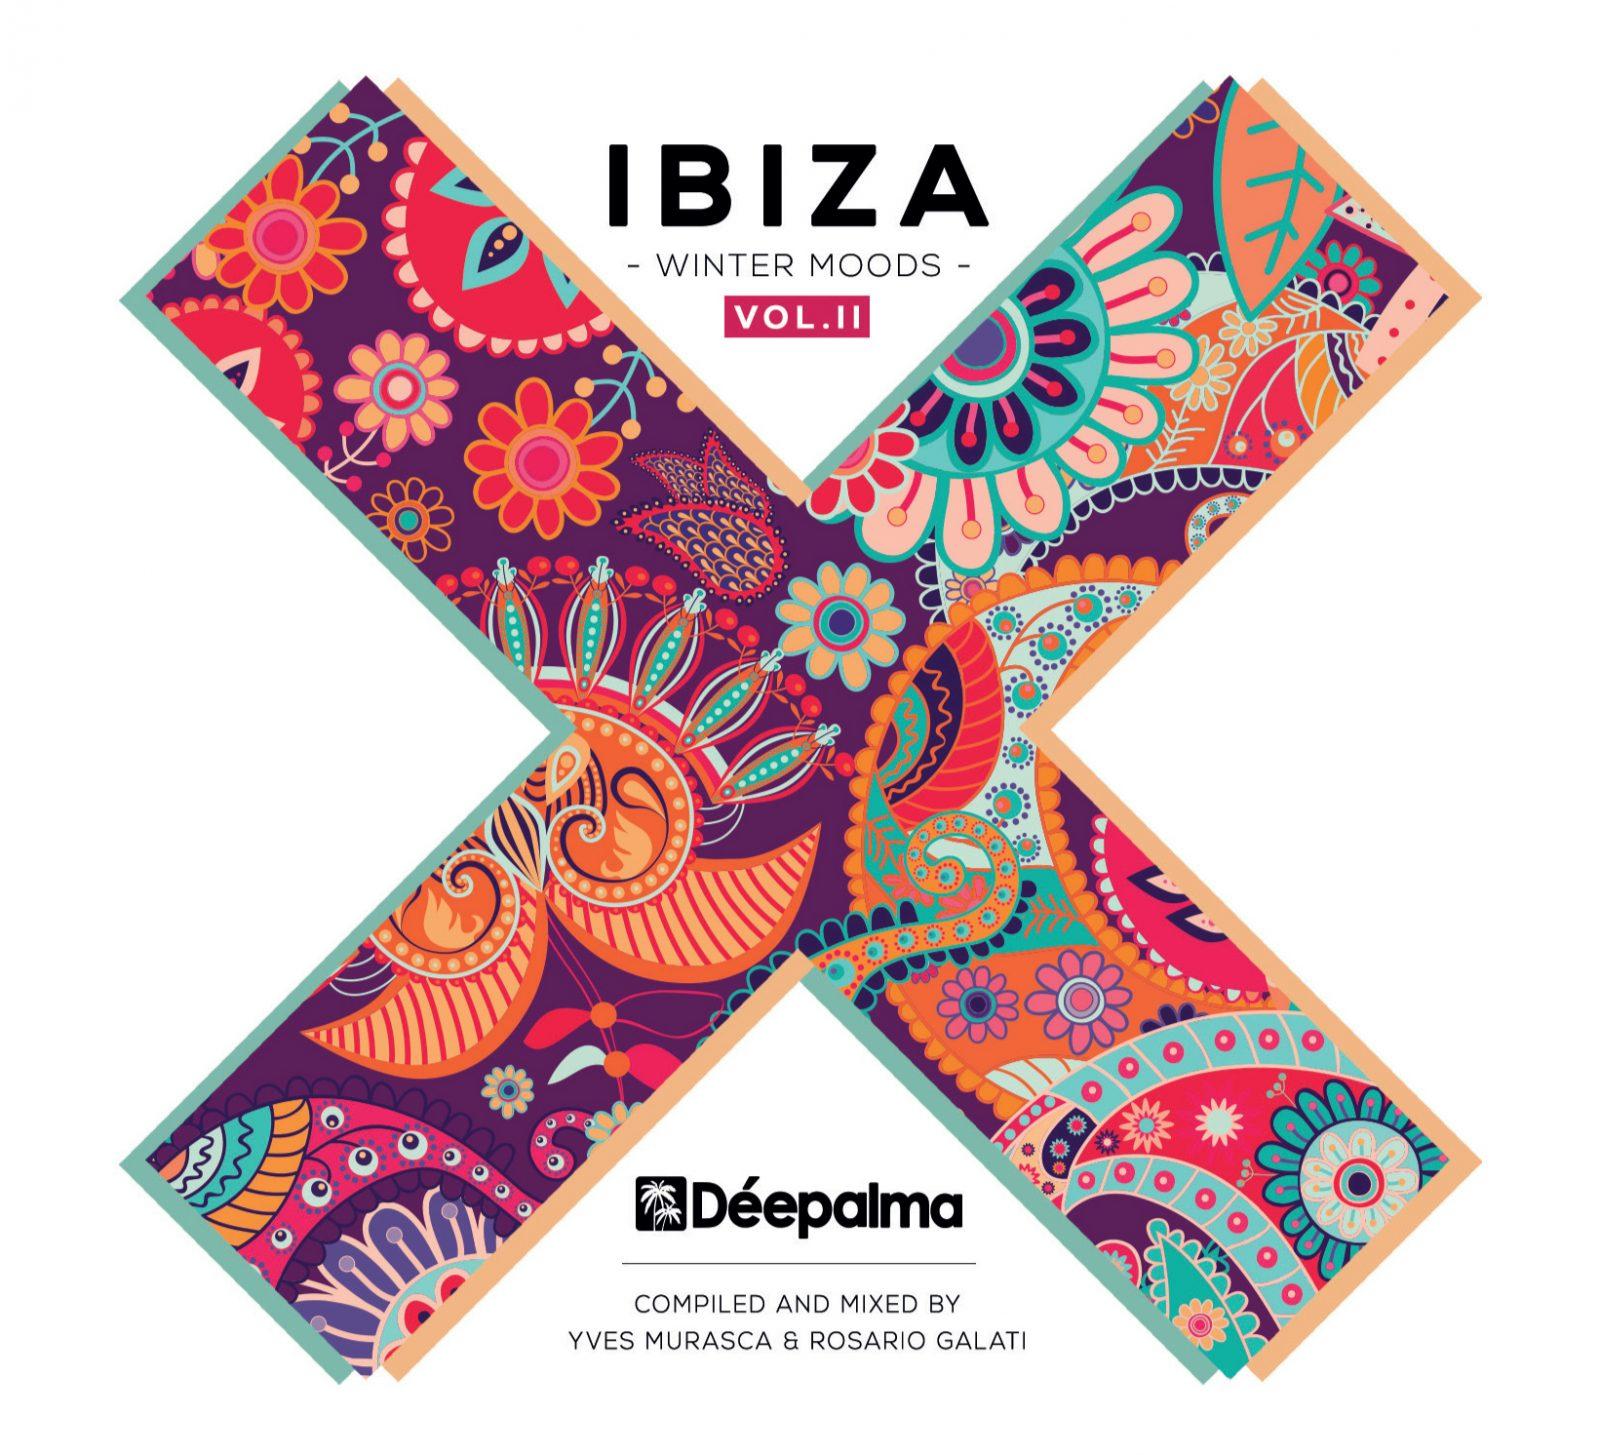 V.A. Déepalma Ibiza Winter Moods, Vol. 2